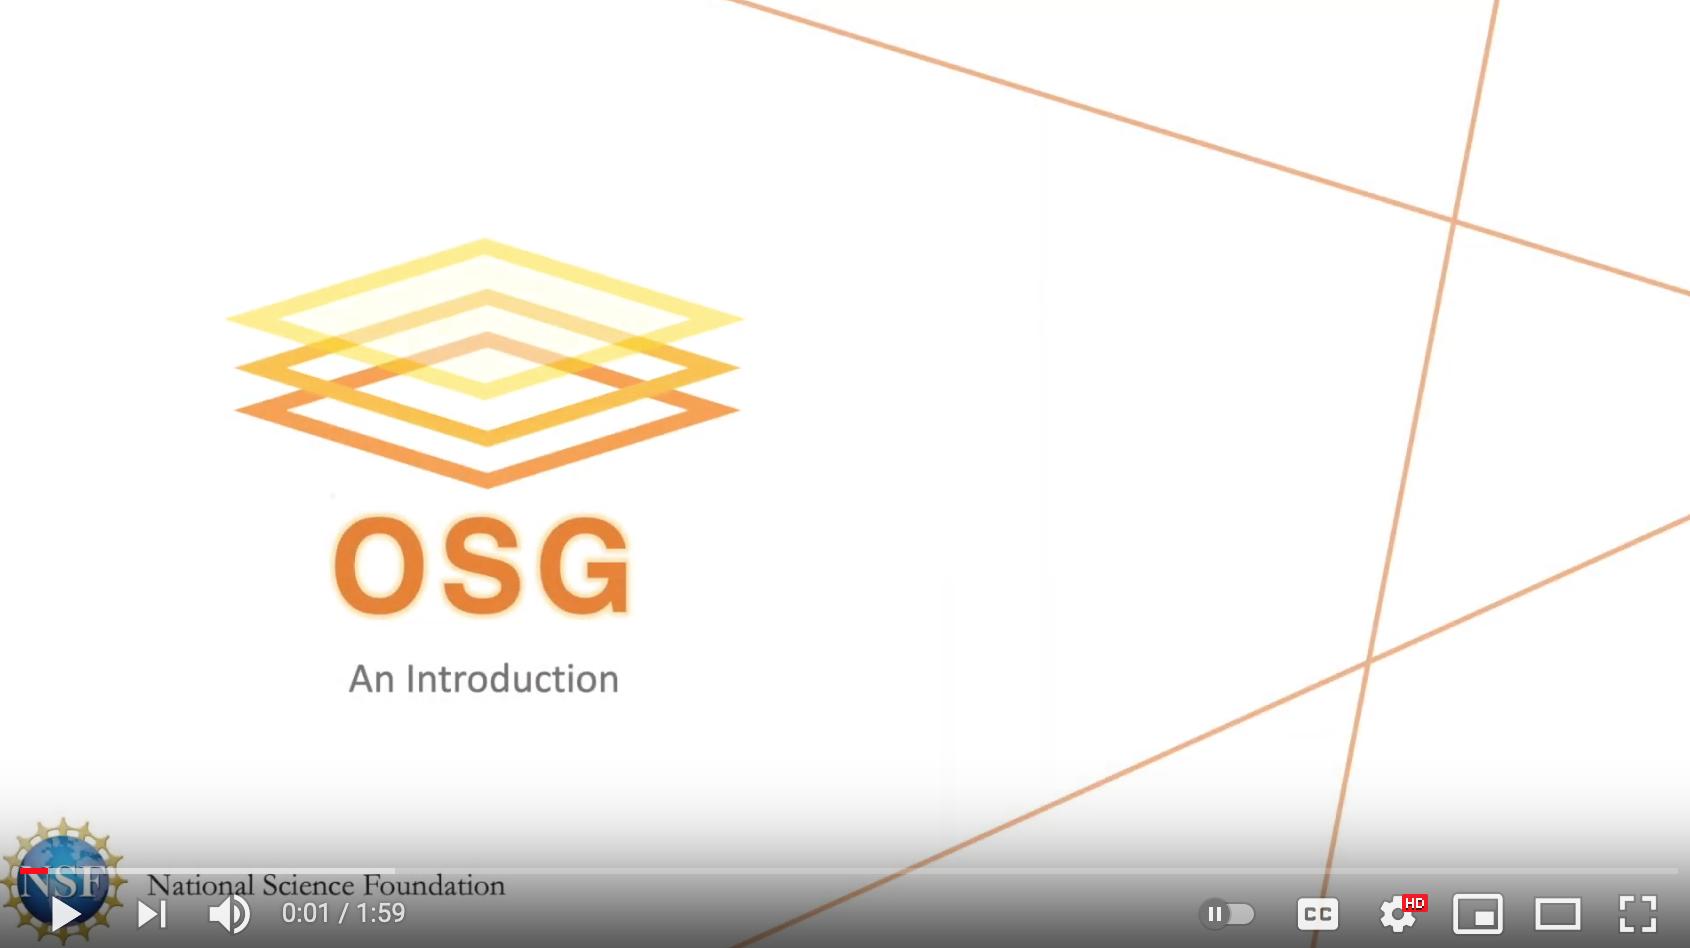 OSG Introduction